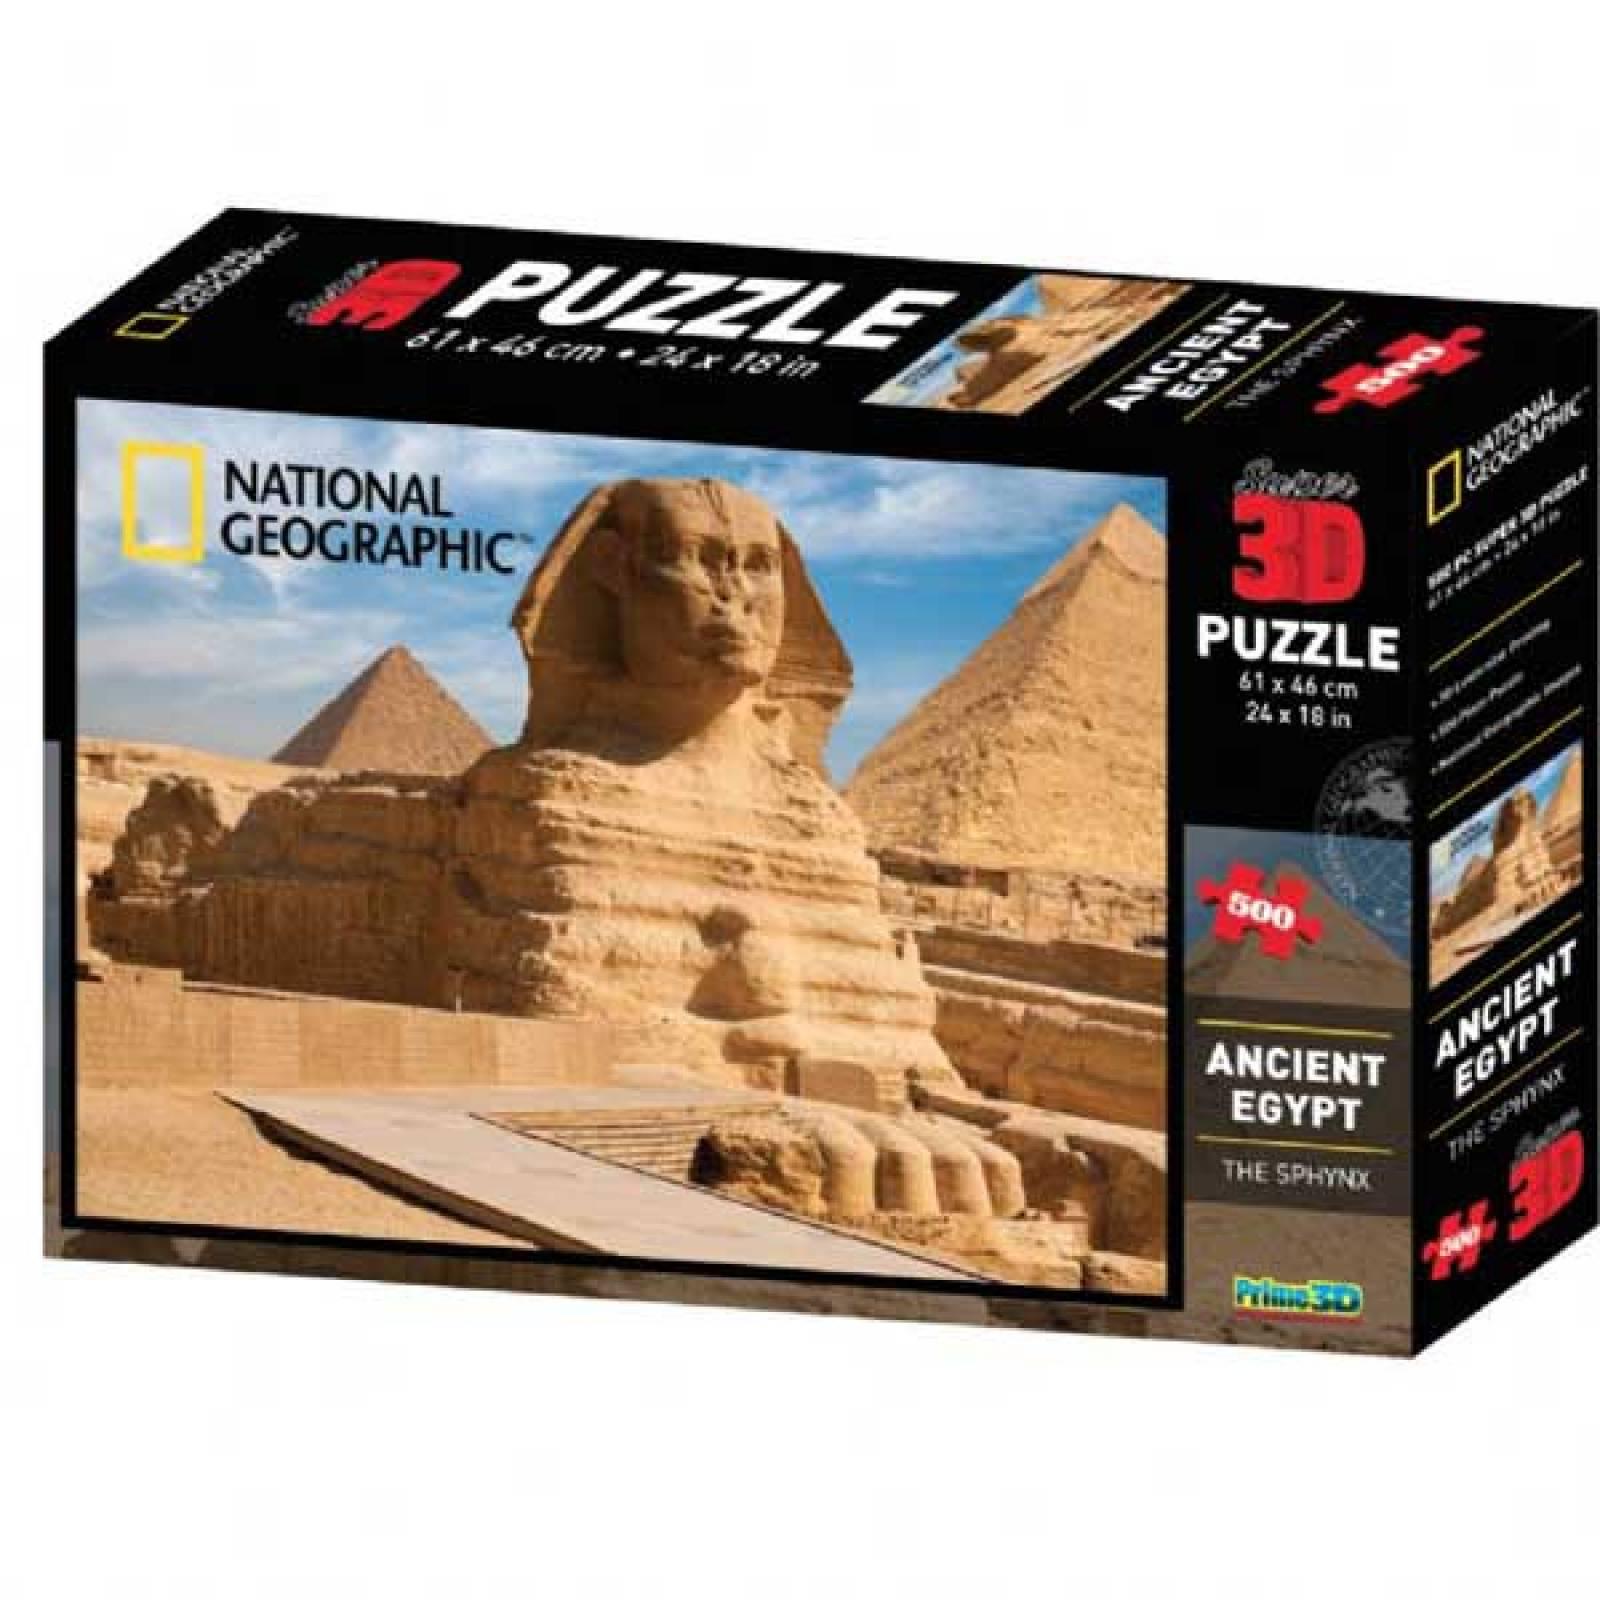 ANCIENT EGYPT Super 3D Puzzle 500pc National Geographic